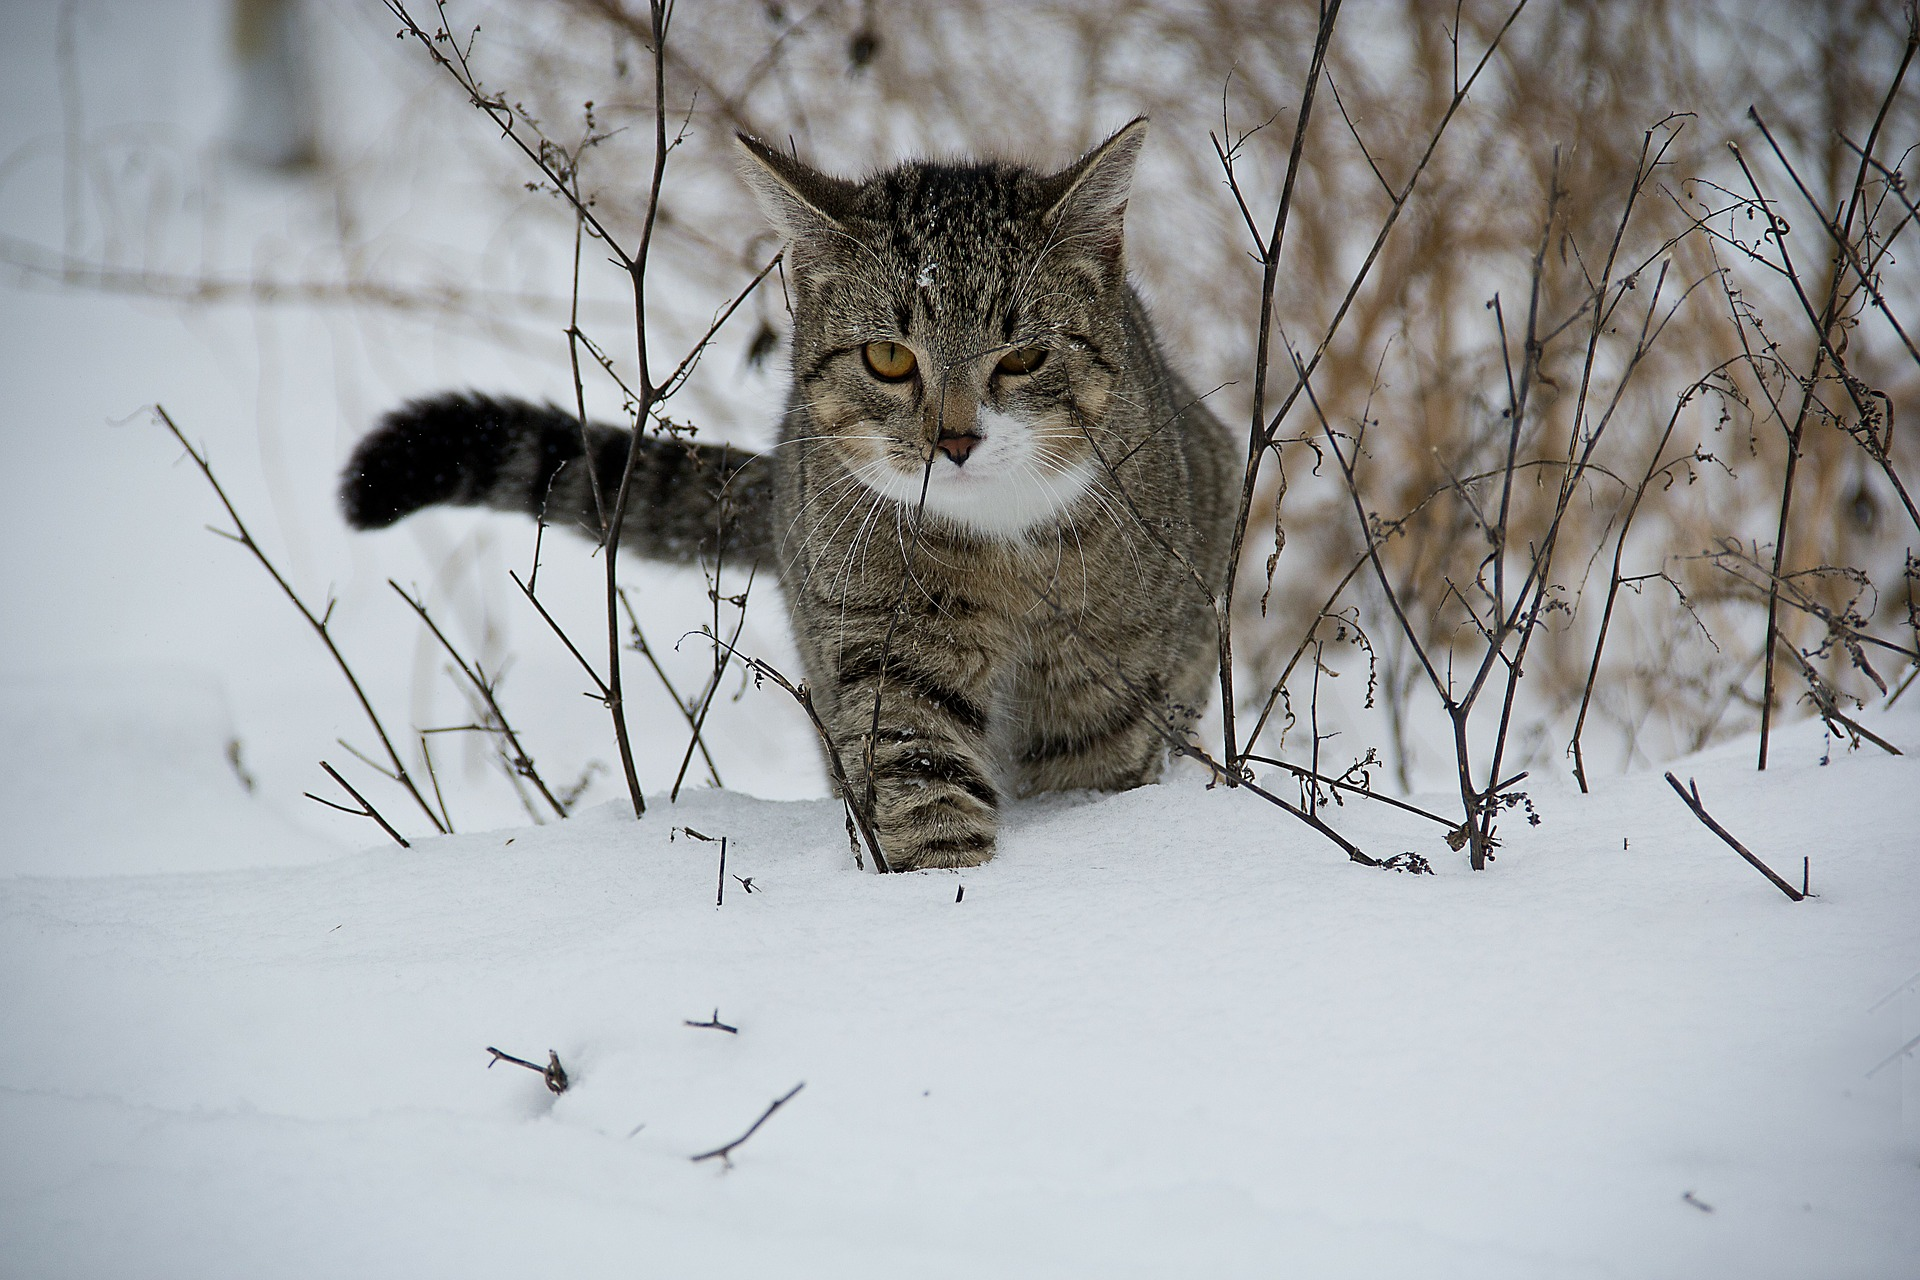 kat killing sne frost frostvejr